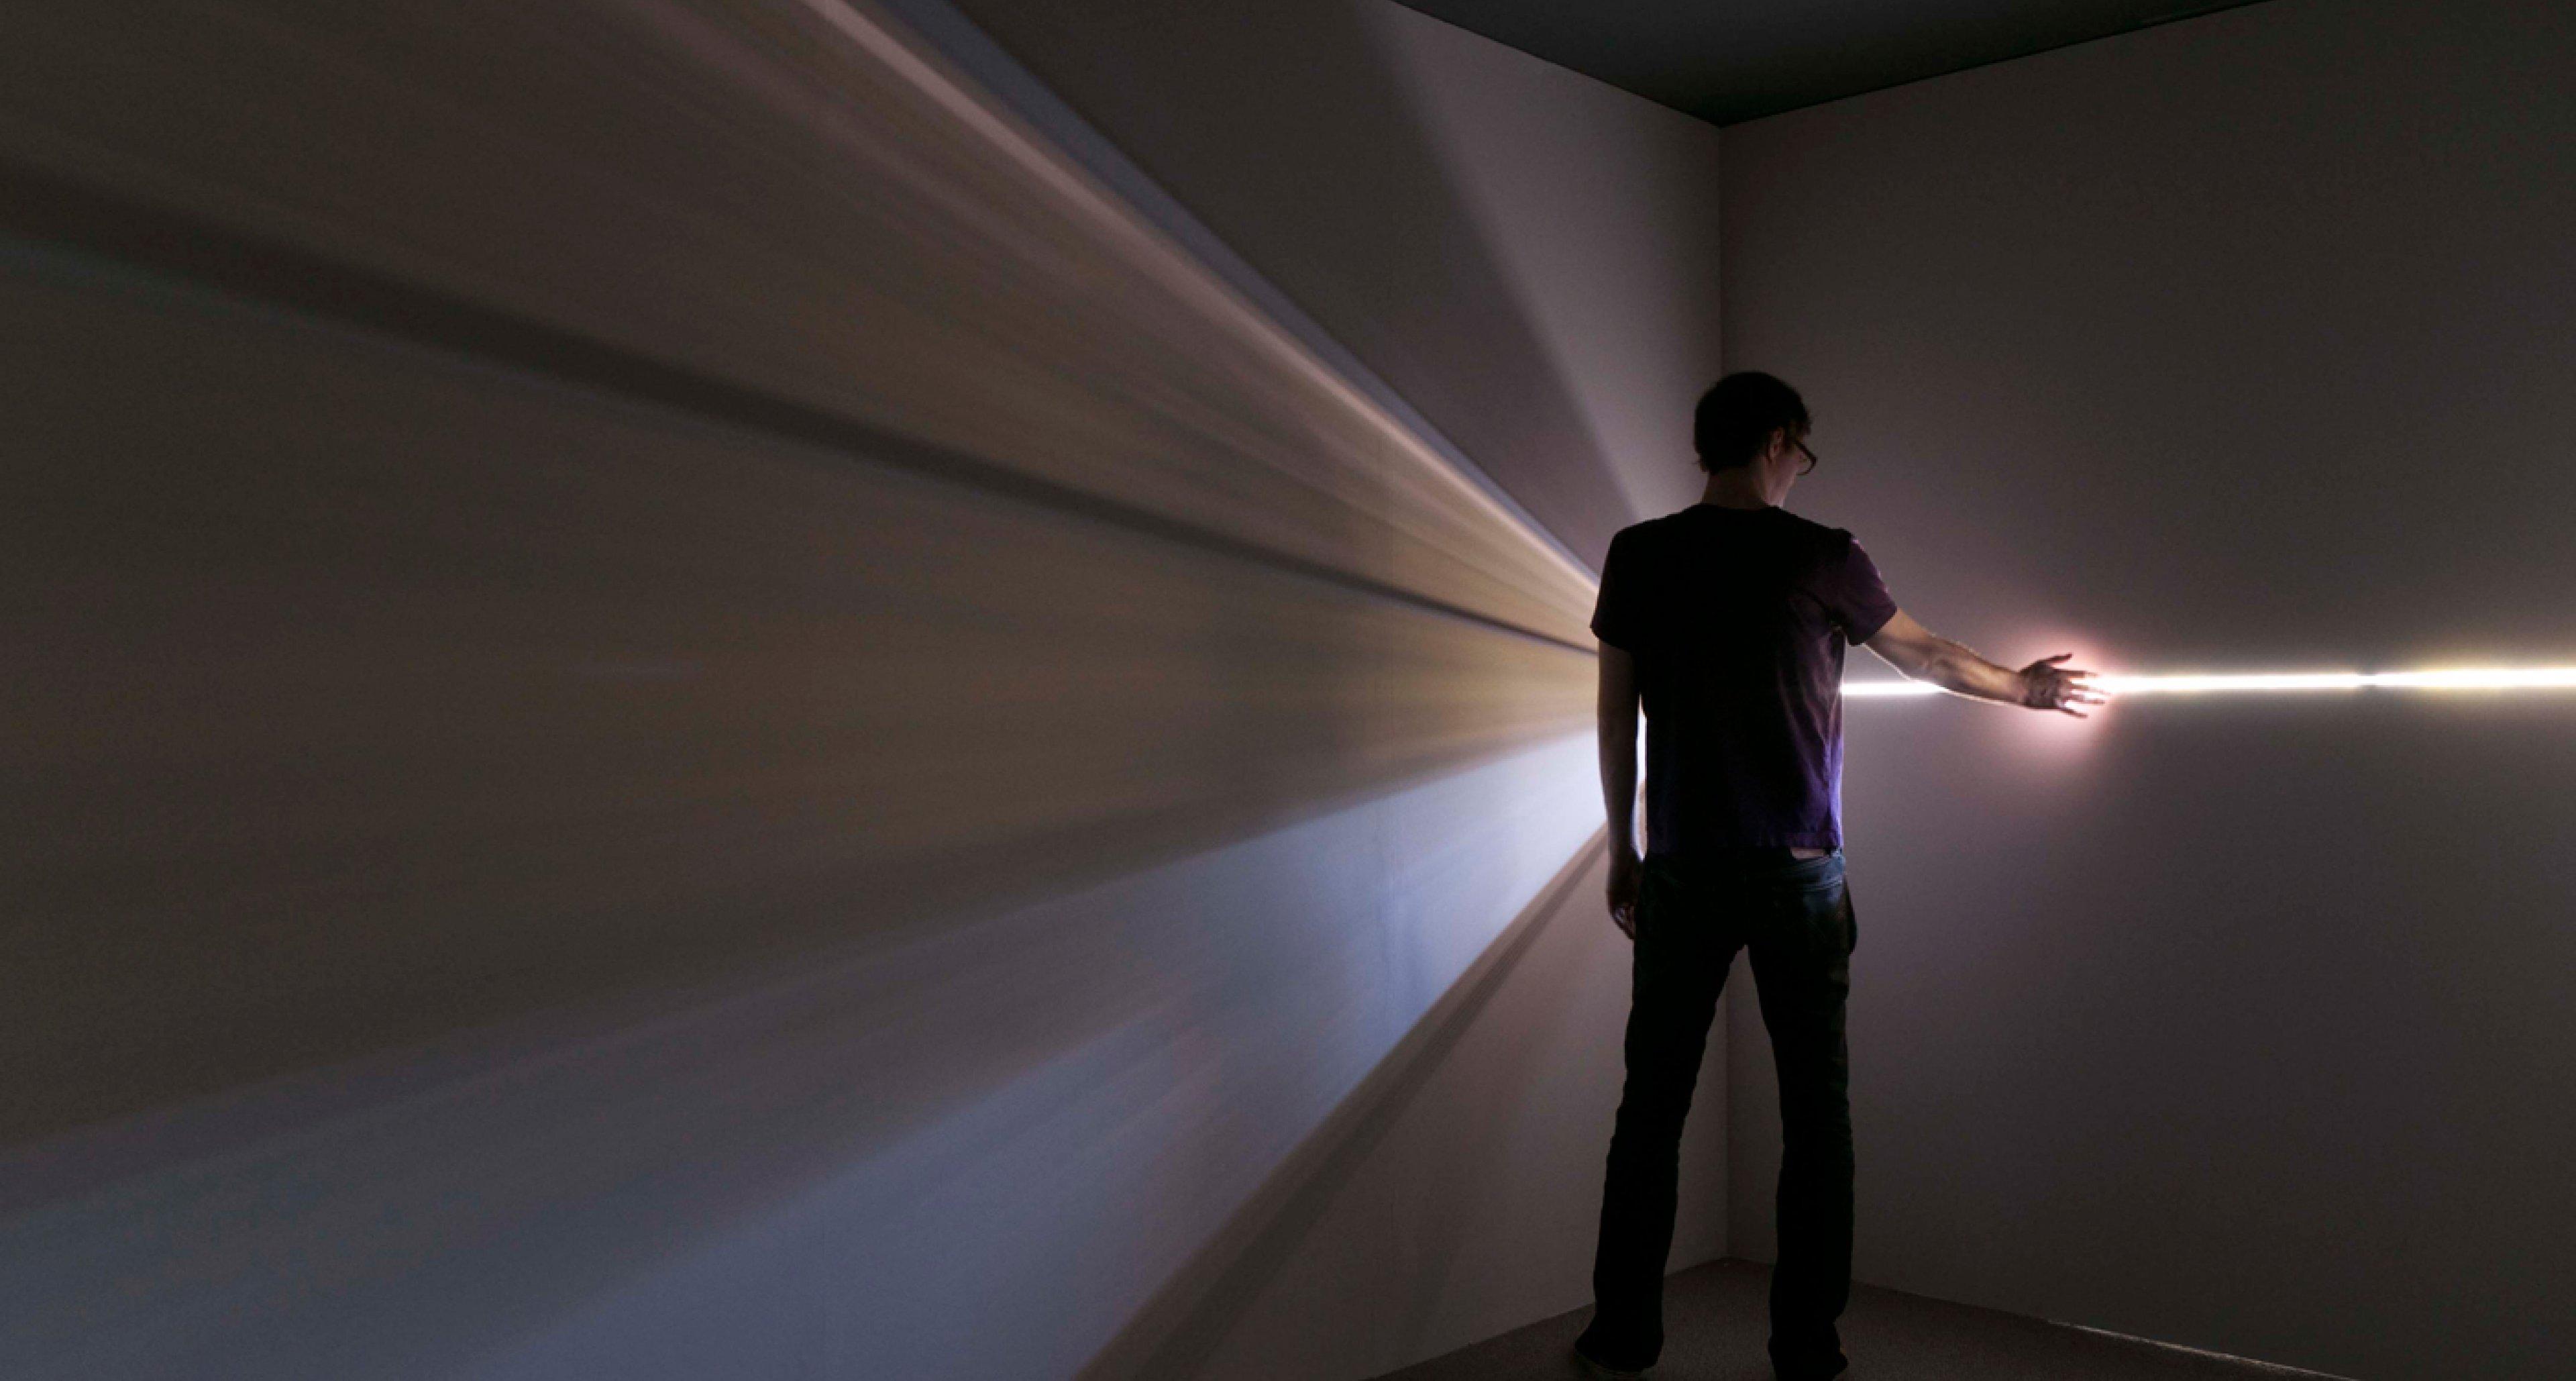 Chris Fraser, Developing a Mutable Horizon 2011 © Chris Fraser, photo: Courtesy of HIGHLIGHT Gallery